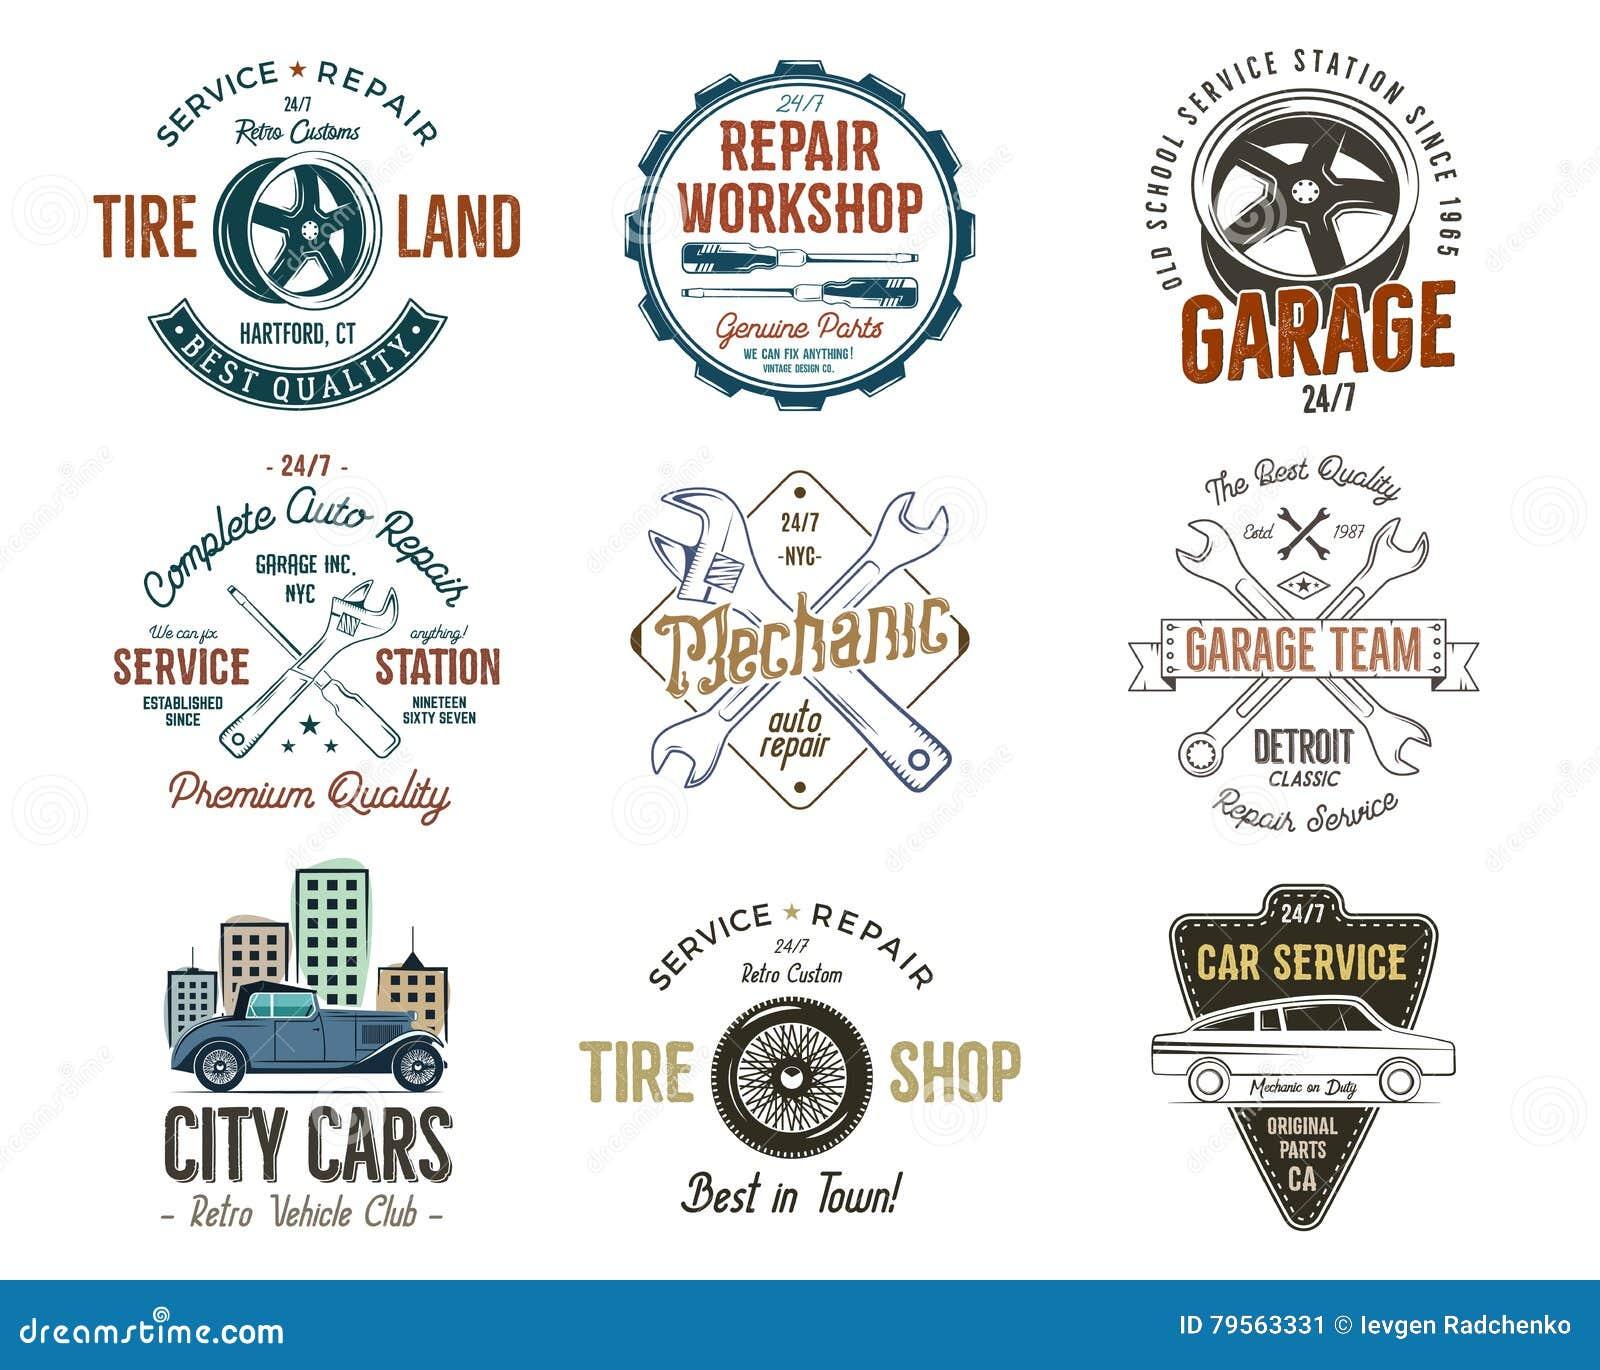 Design car repair workshop - Vintage Car Service Badges Garage Repair Labels And Insignias Collection Retro Colors Design